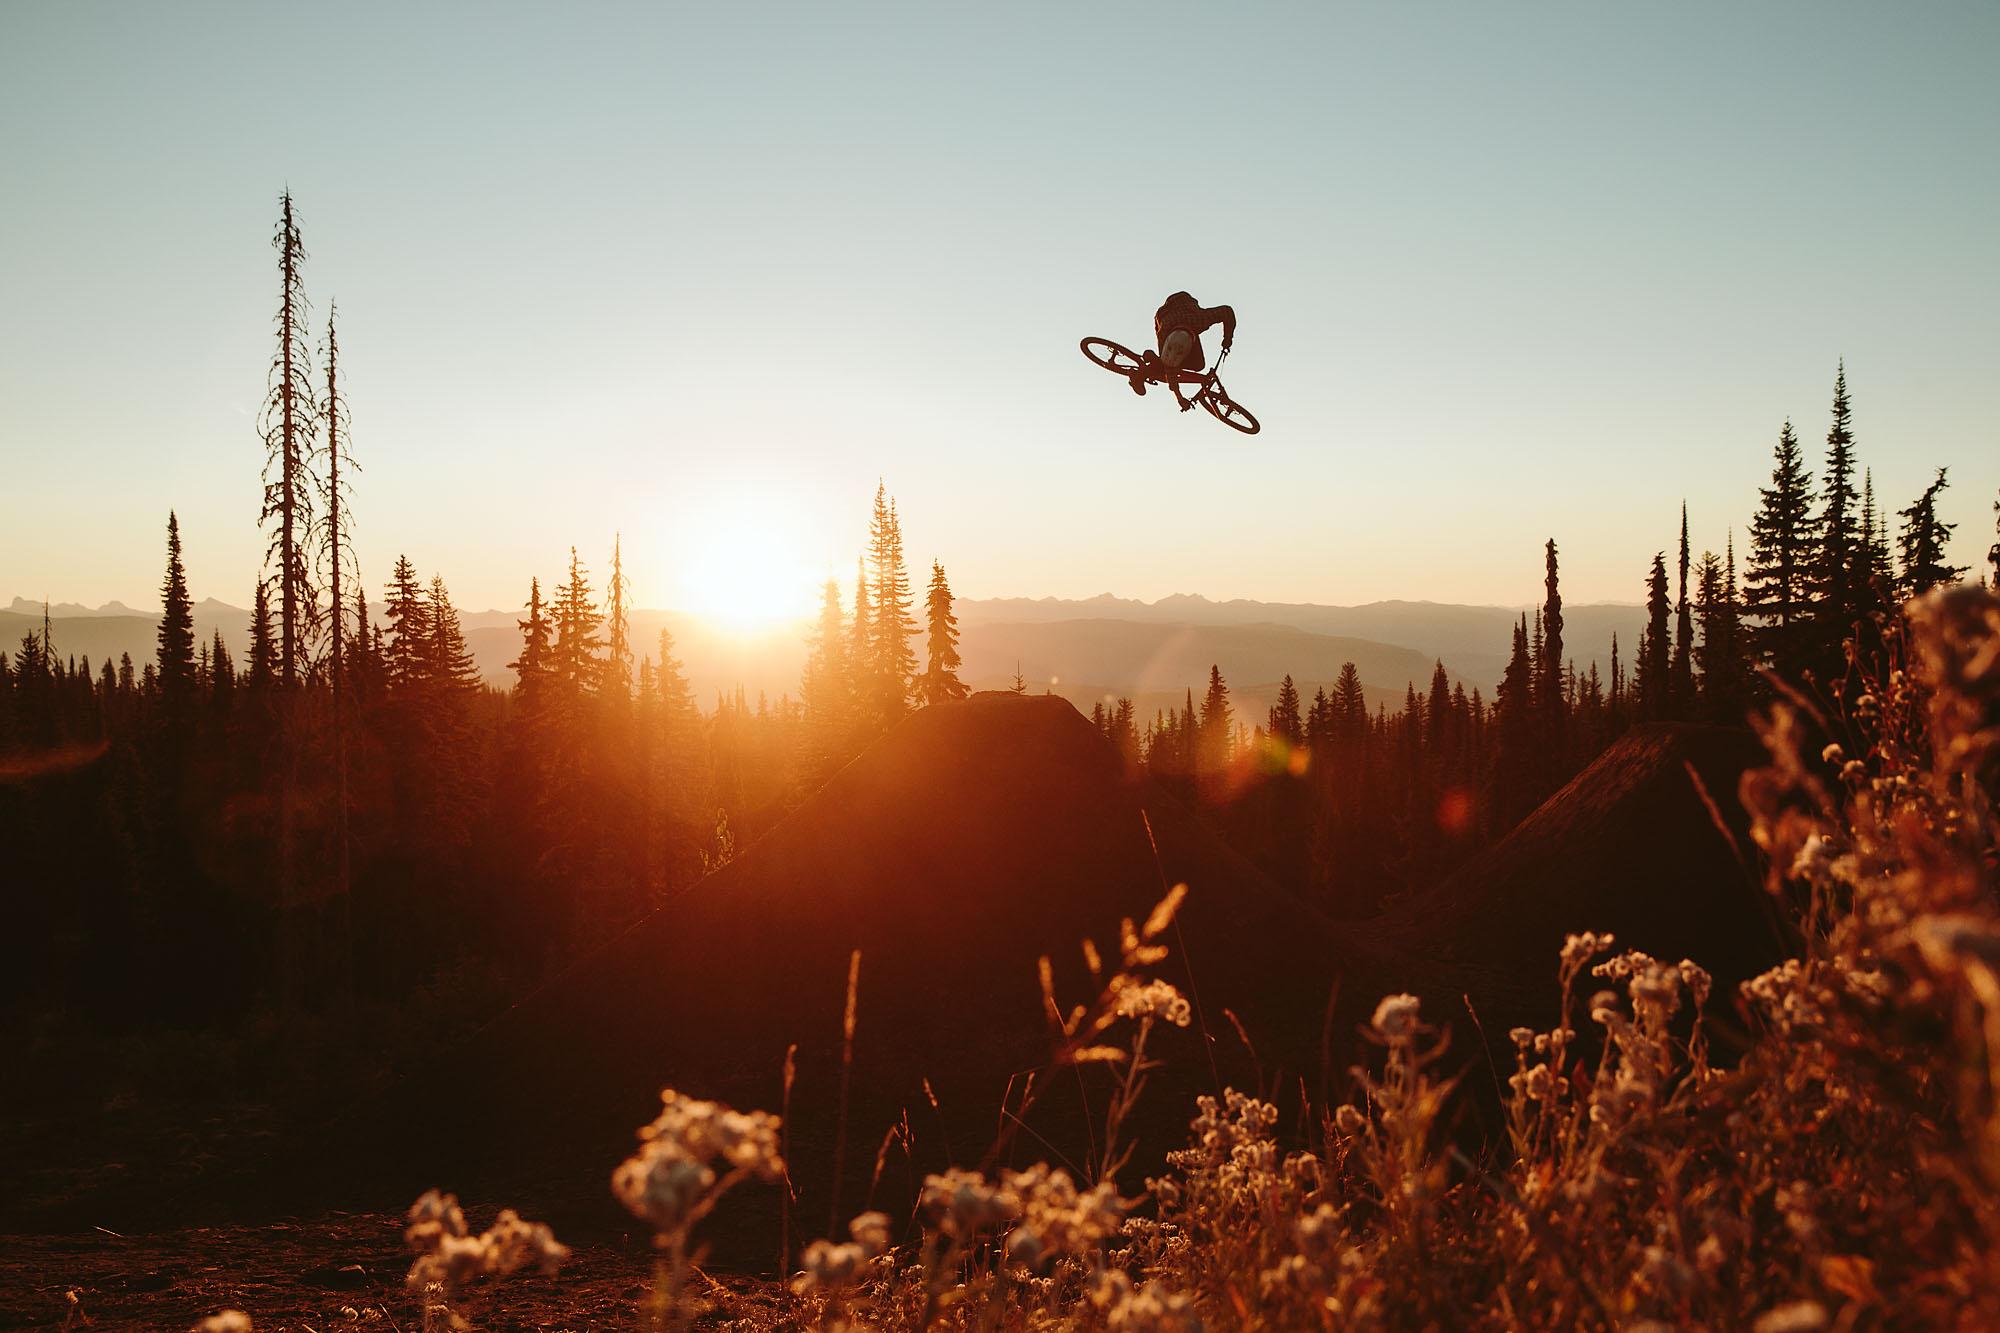 Brett Rheeder / Beautiful Idiot / Robb Thompson Photo